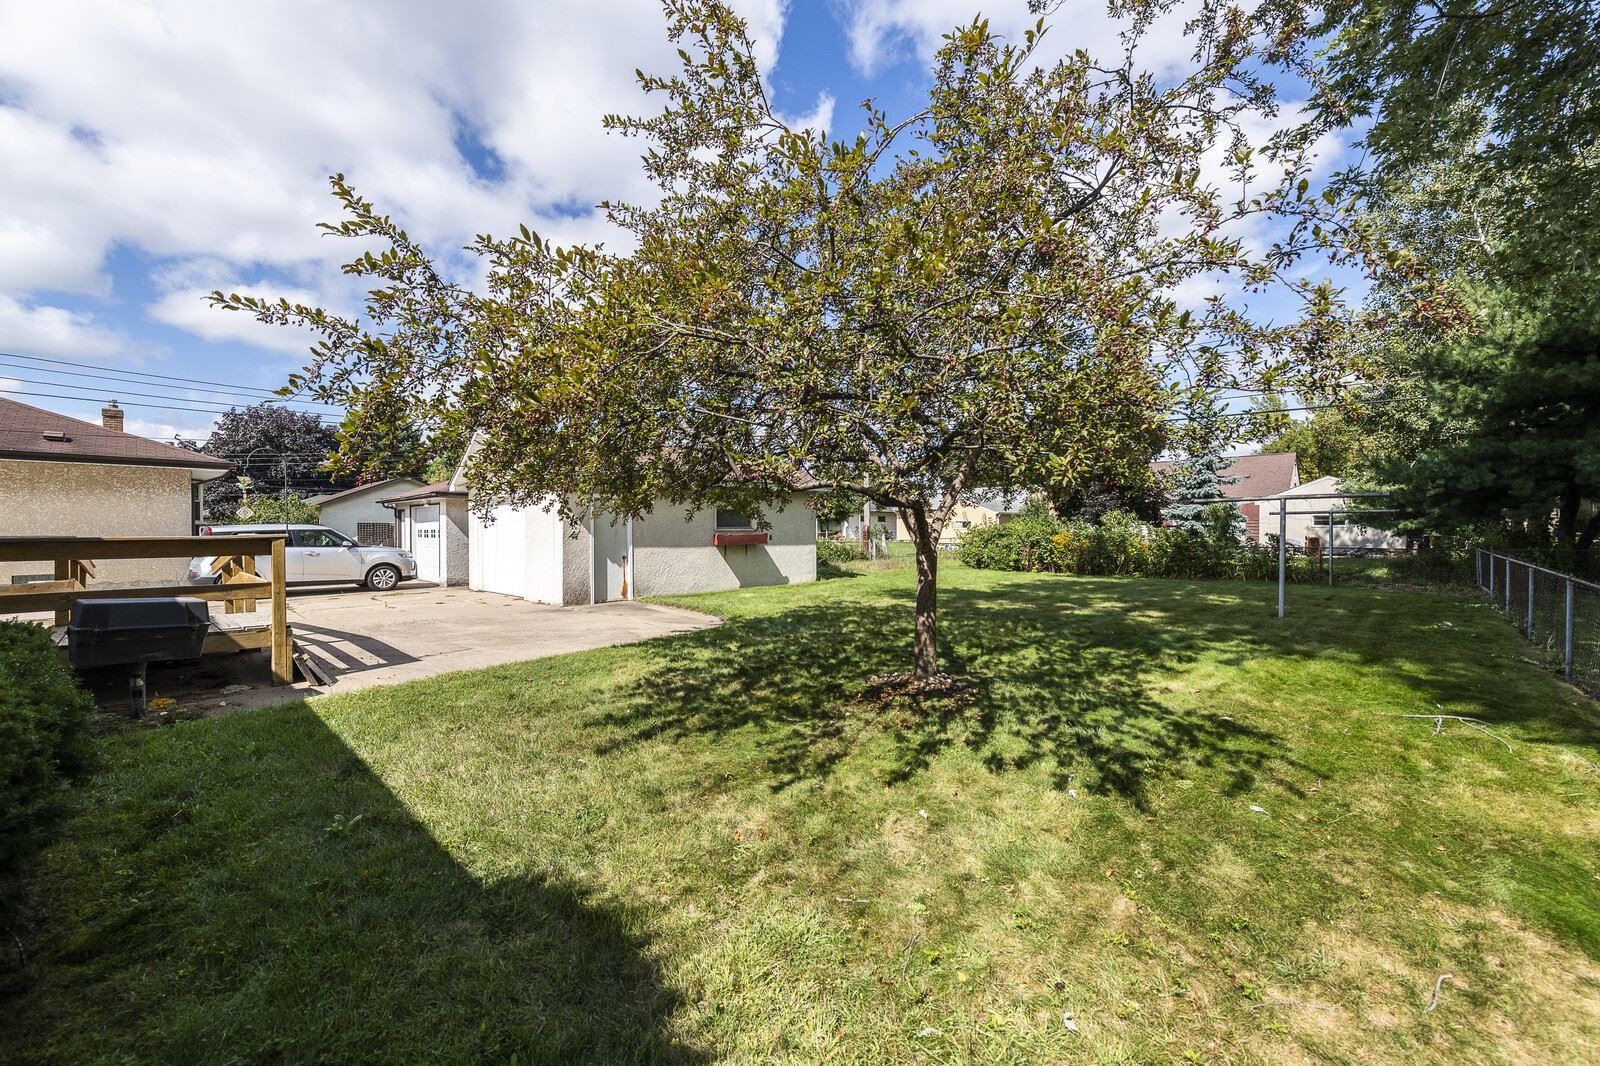 126 Poplar Street W, South Saint Paul, MN 55075 - MLS#: 5656973